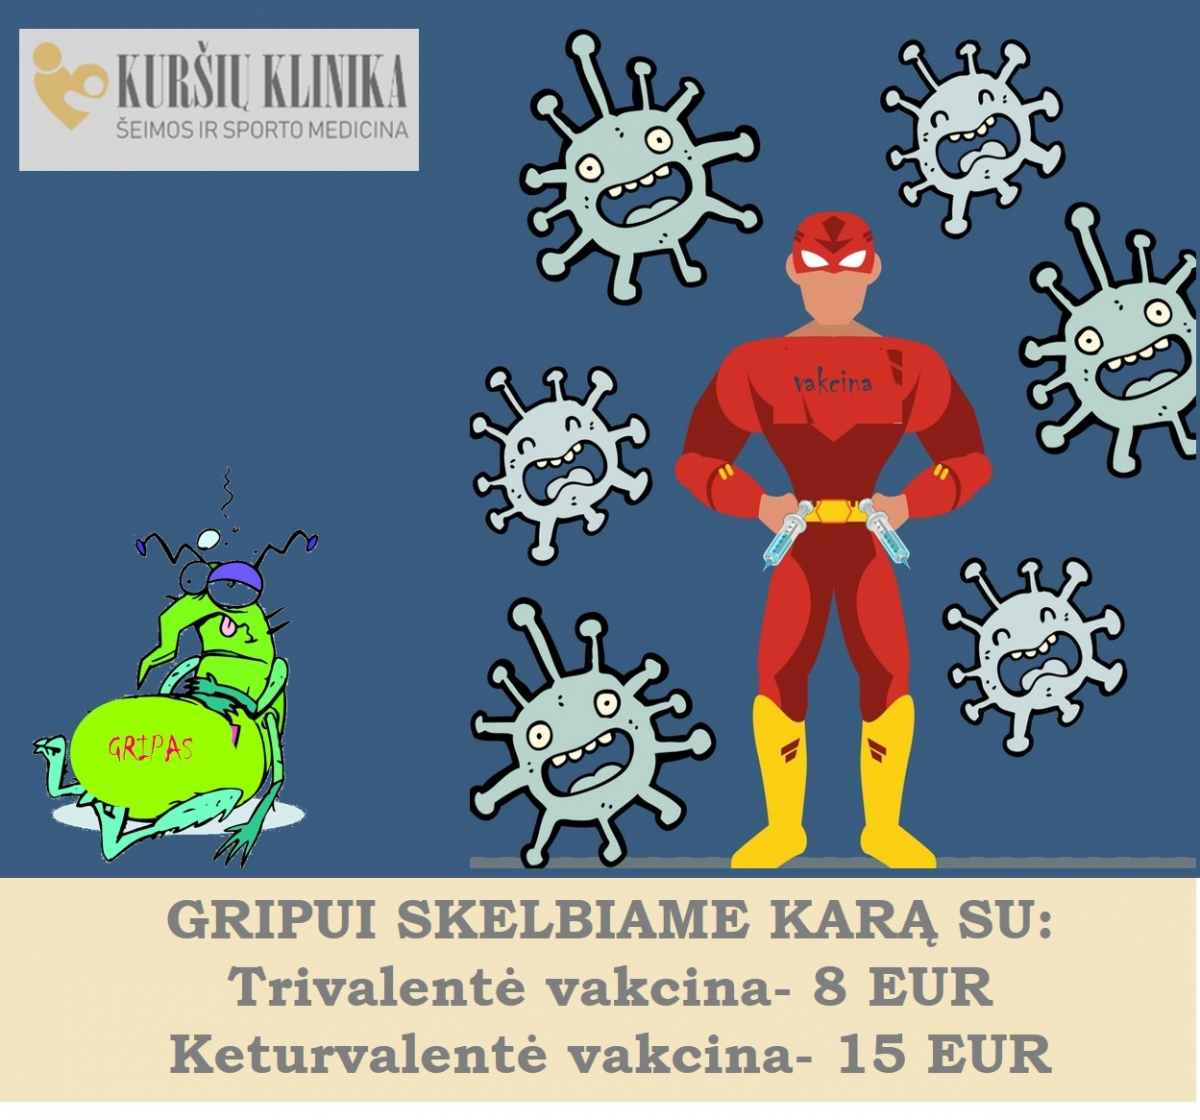 Gripui skelbsime karą jau dabar❗Trivalentė vakcina- 8 EUR, Keturvalentė vakcina- 15 EUR